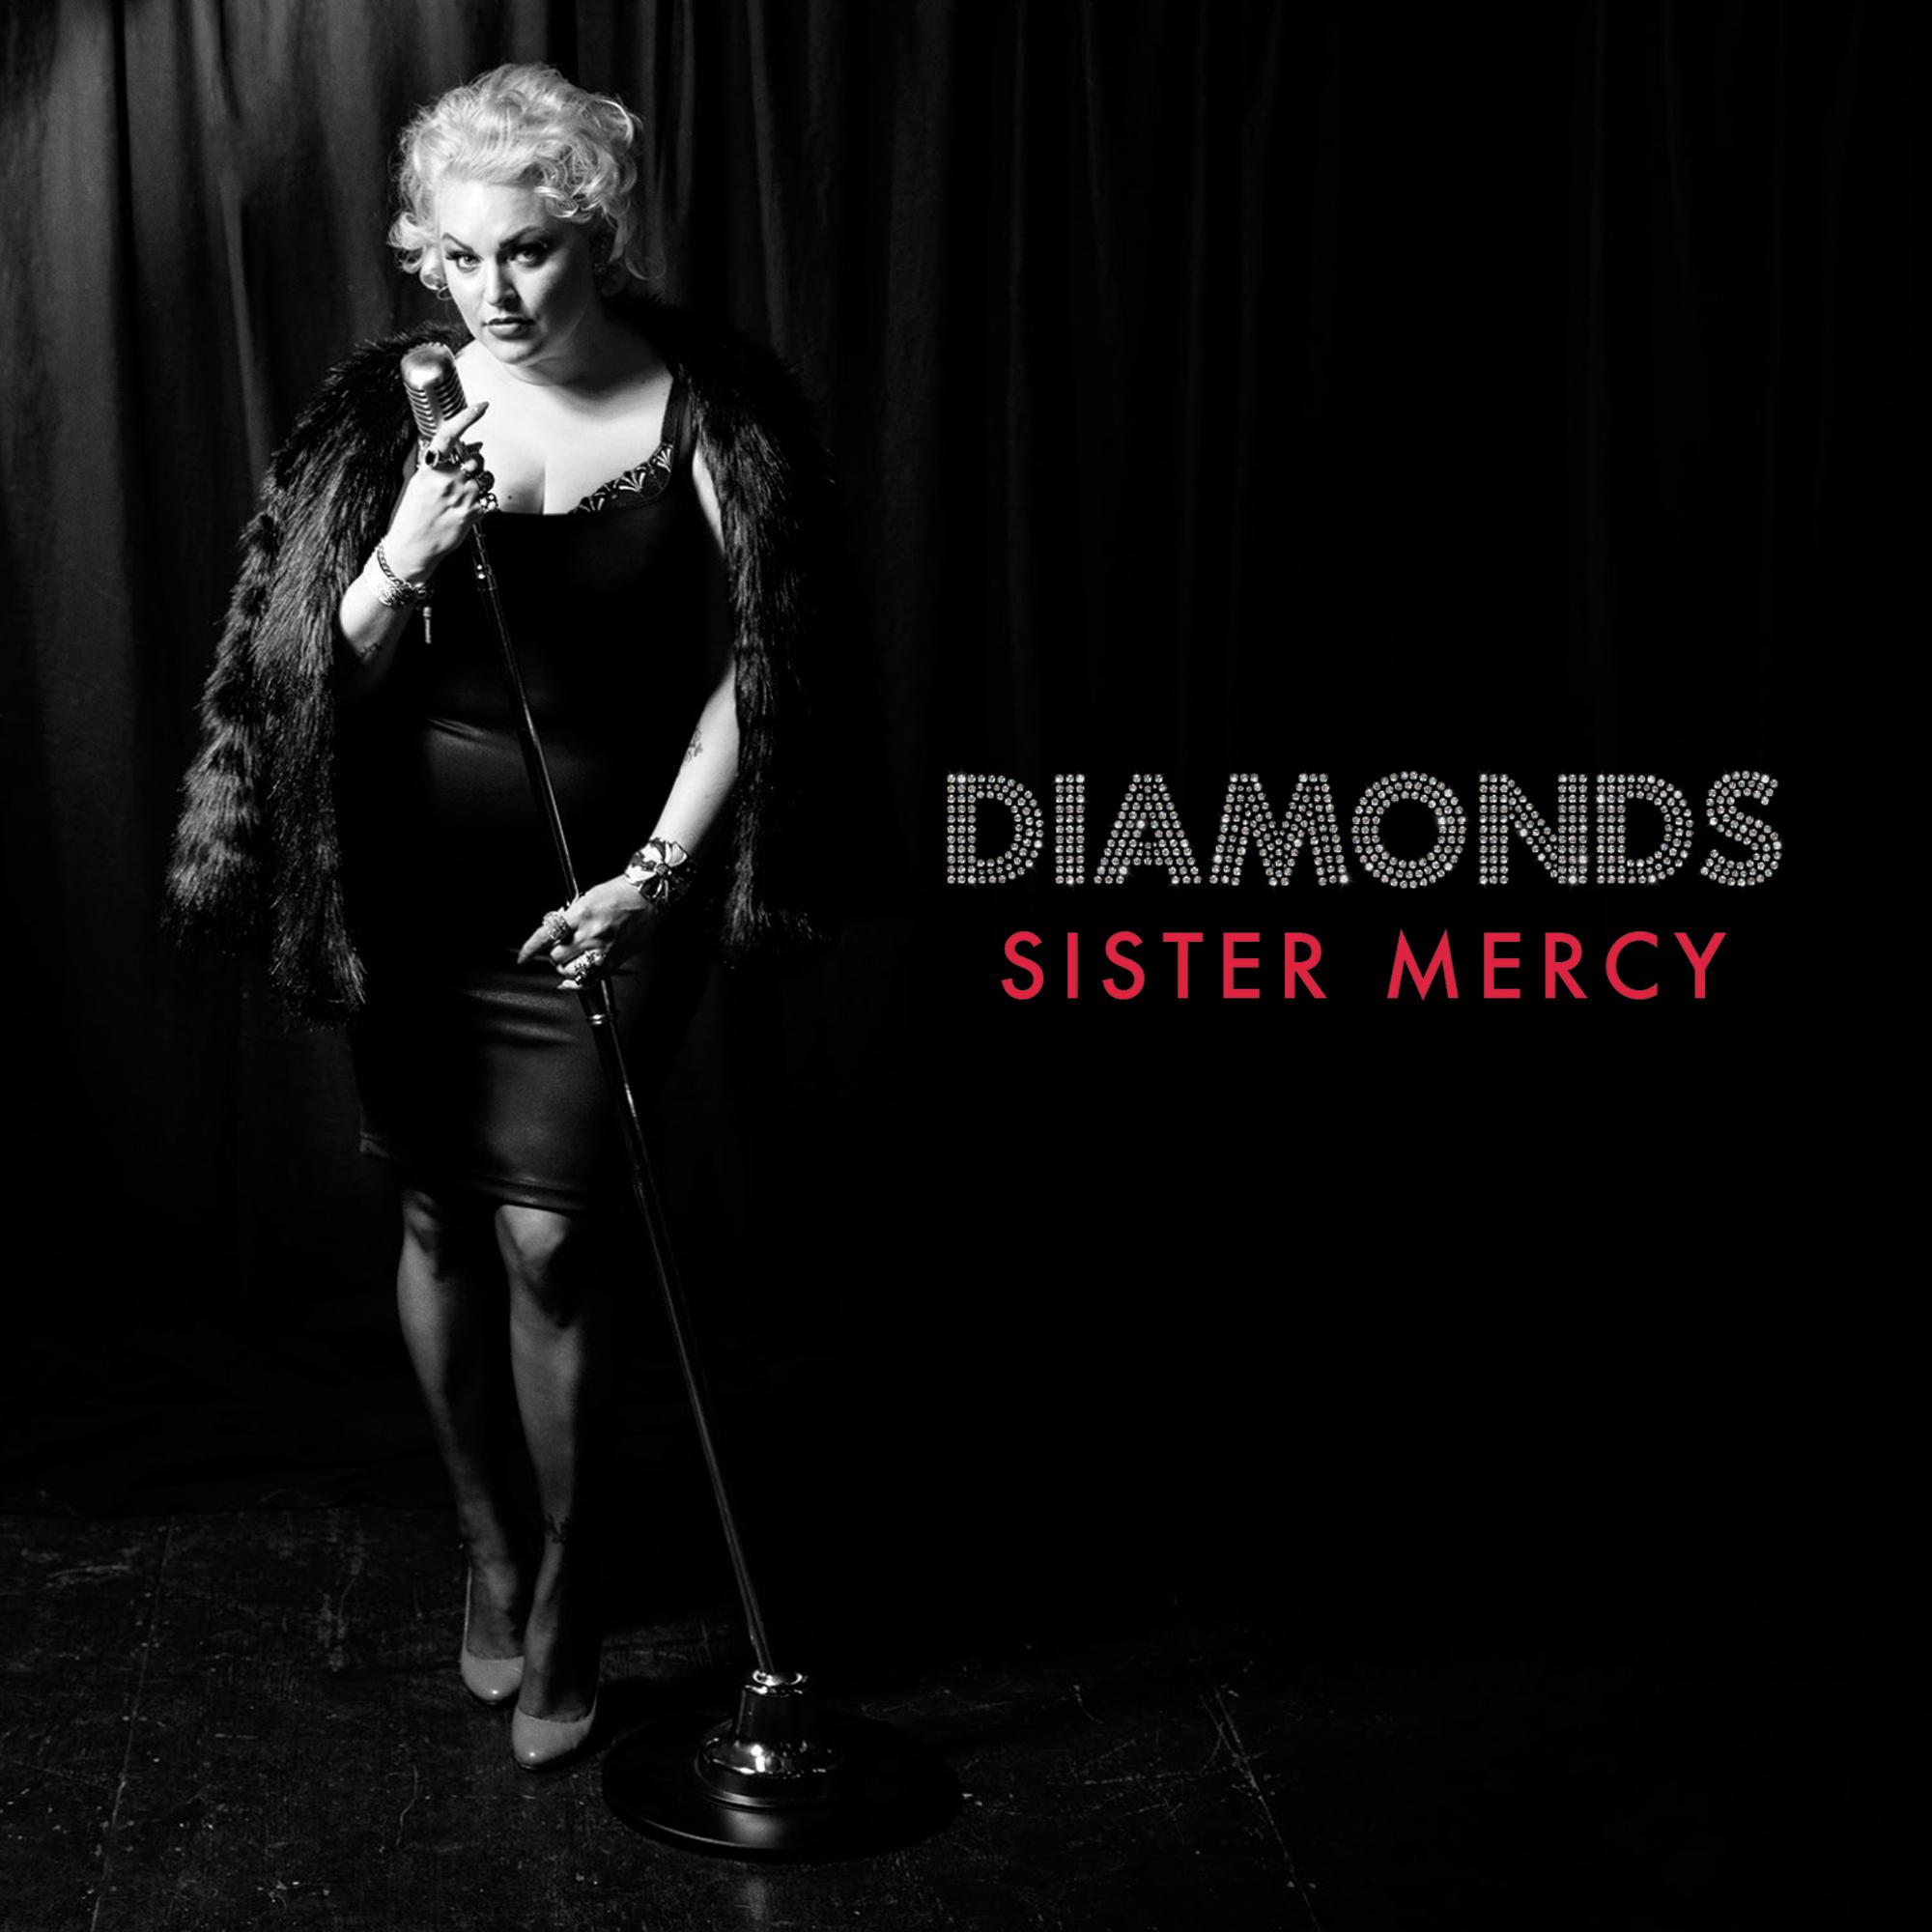 Sister Mercy